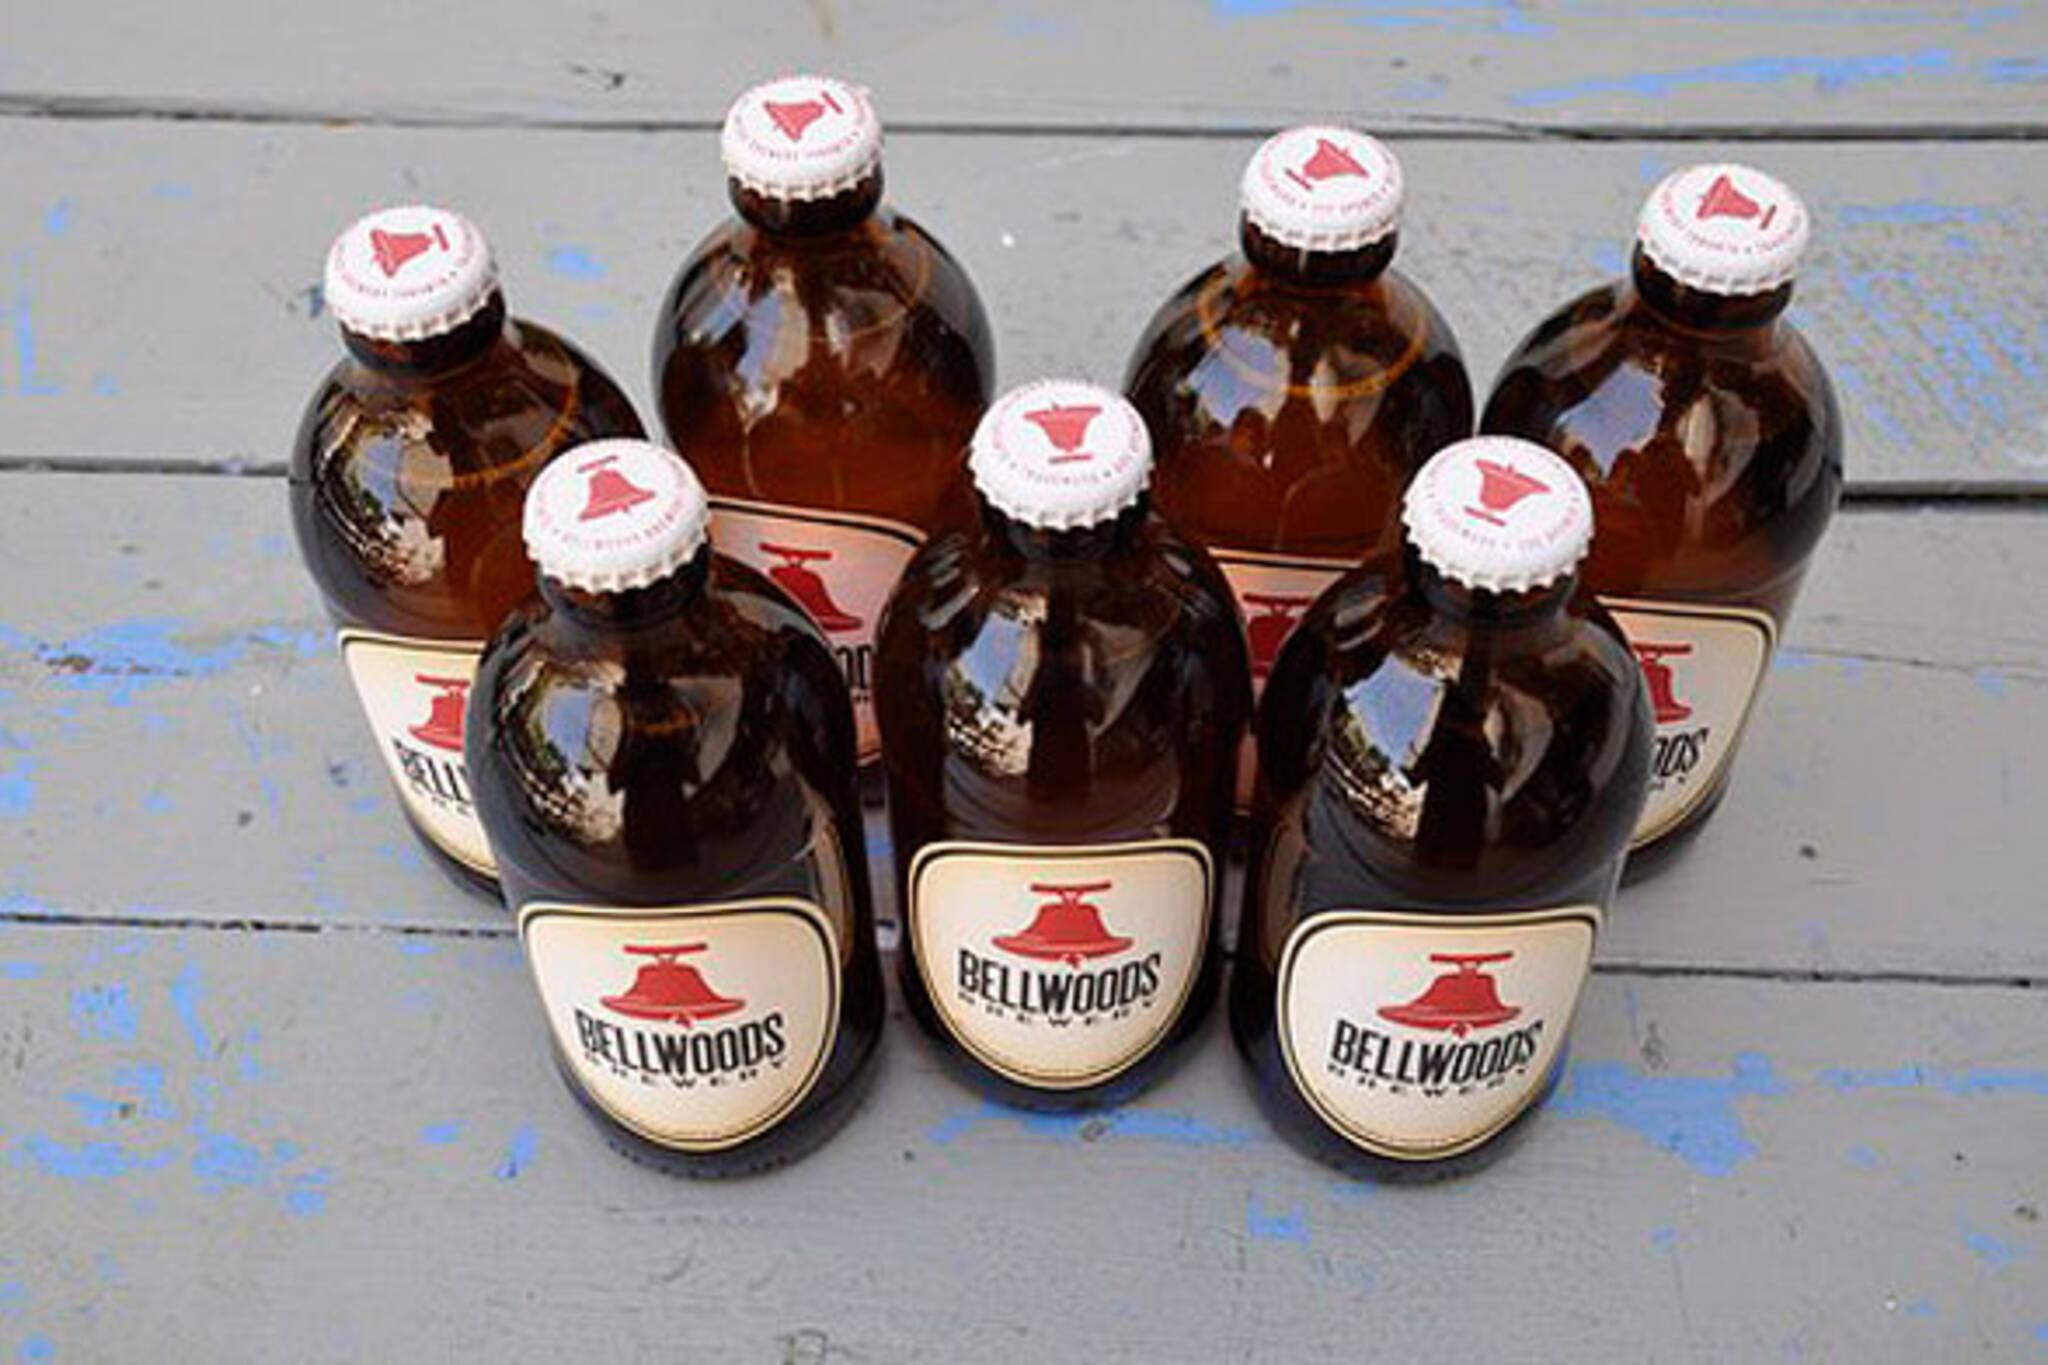 bellwoods brewery stubbies